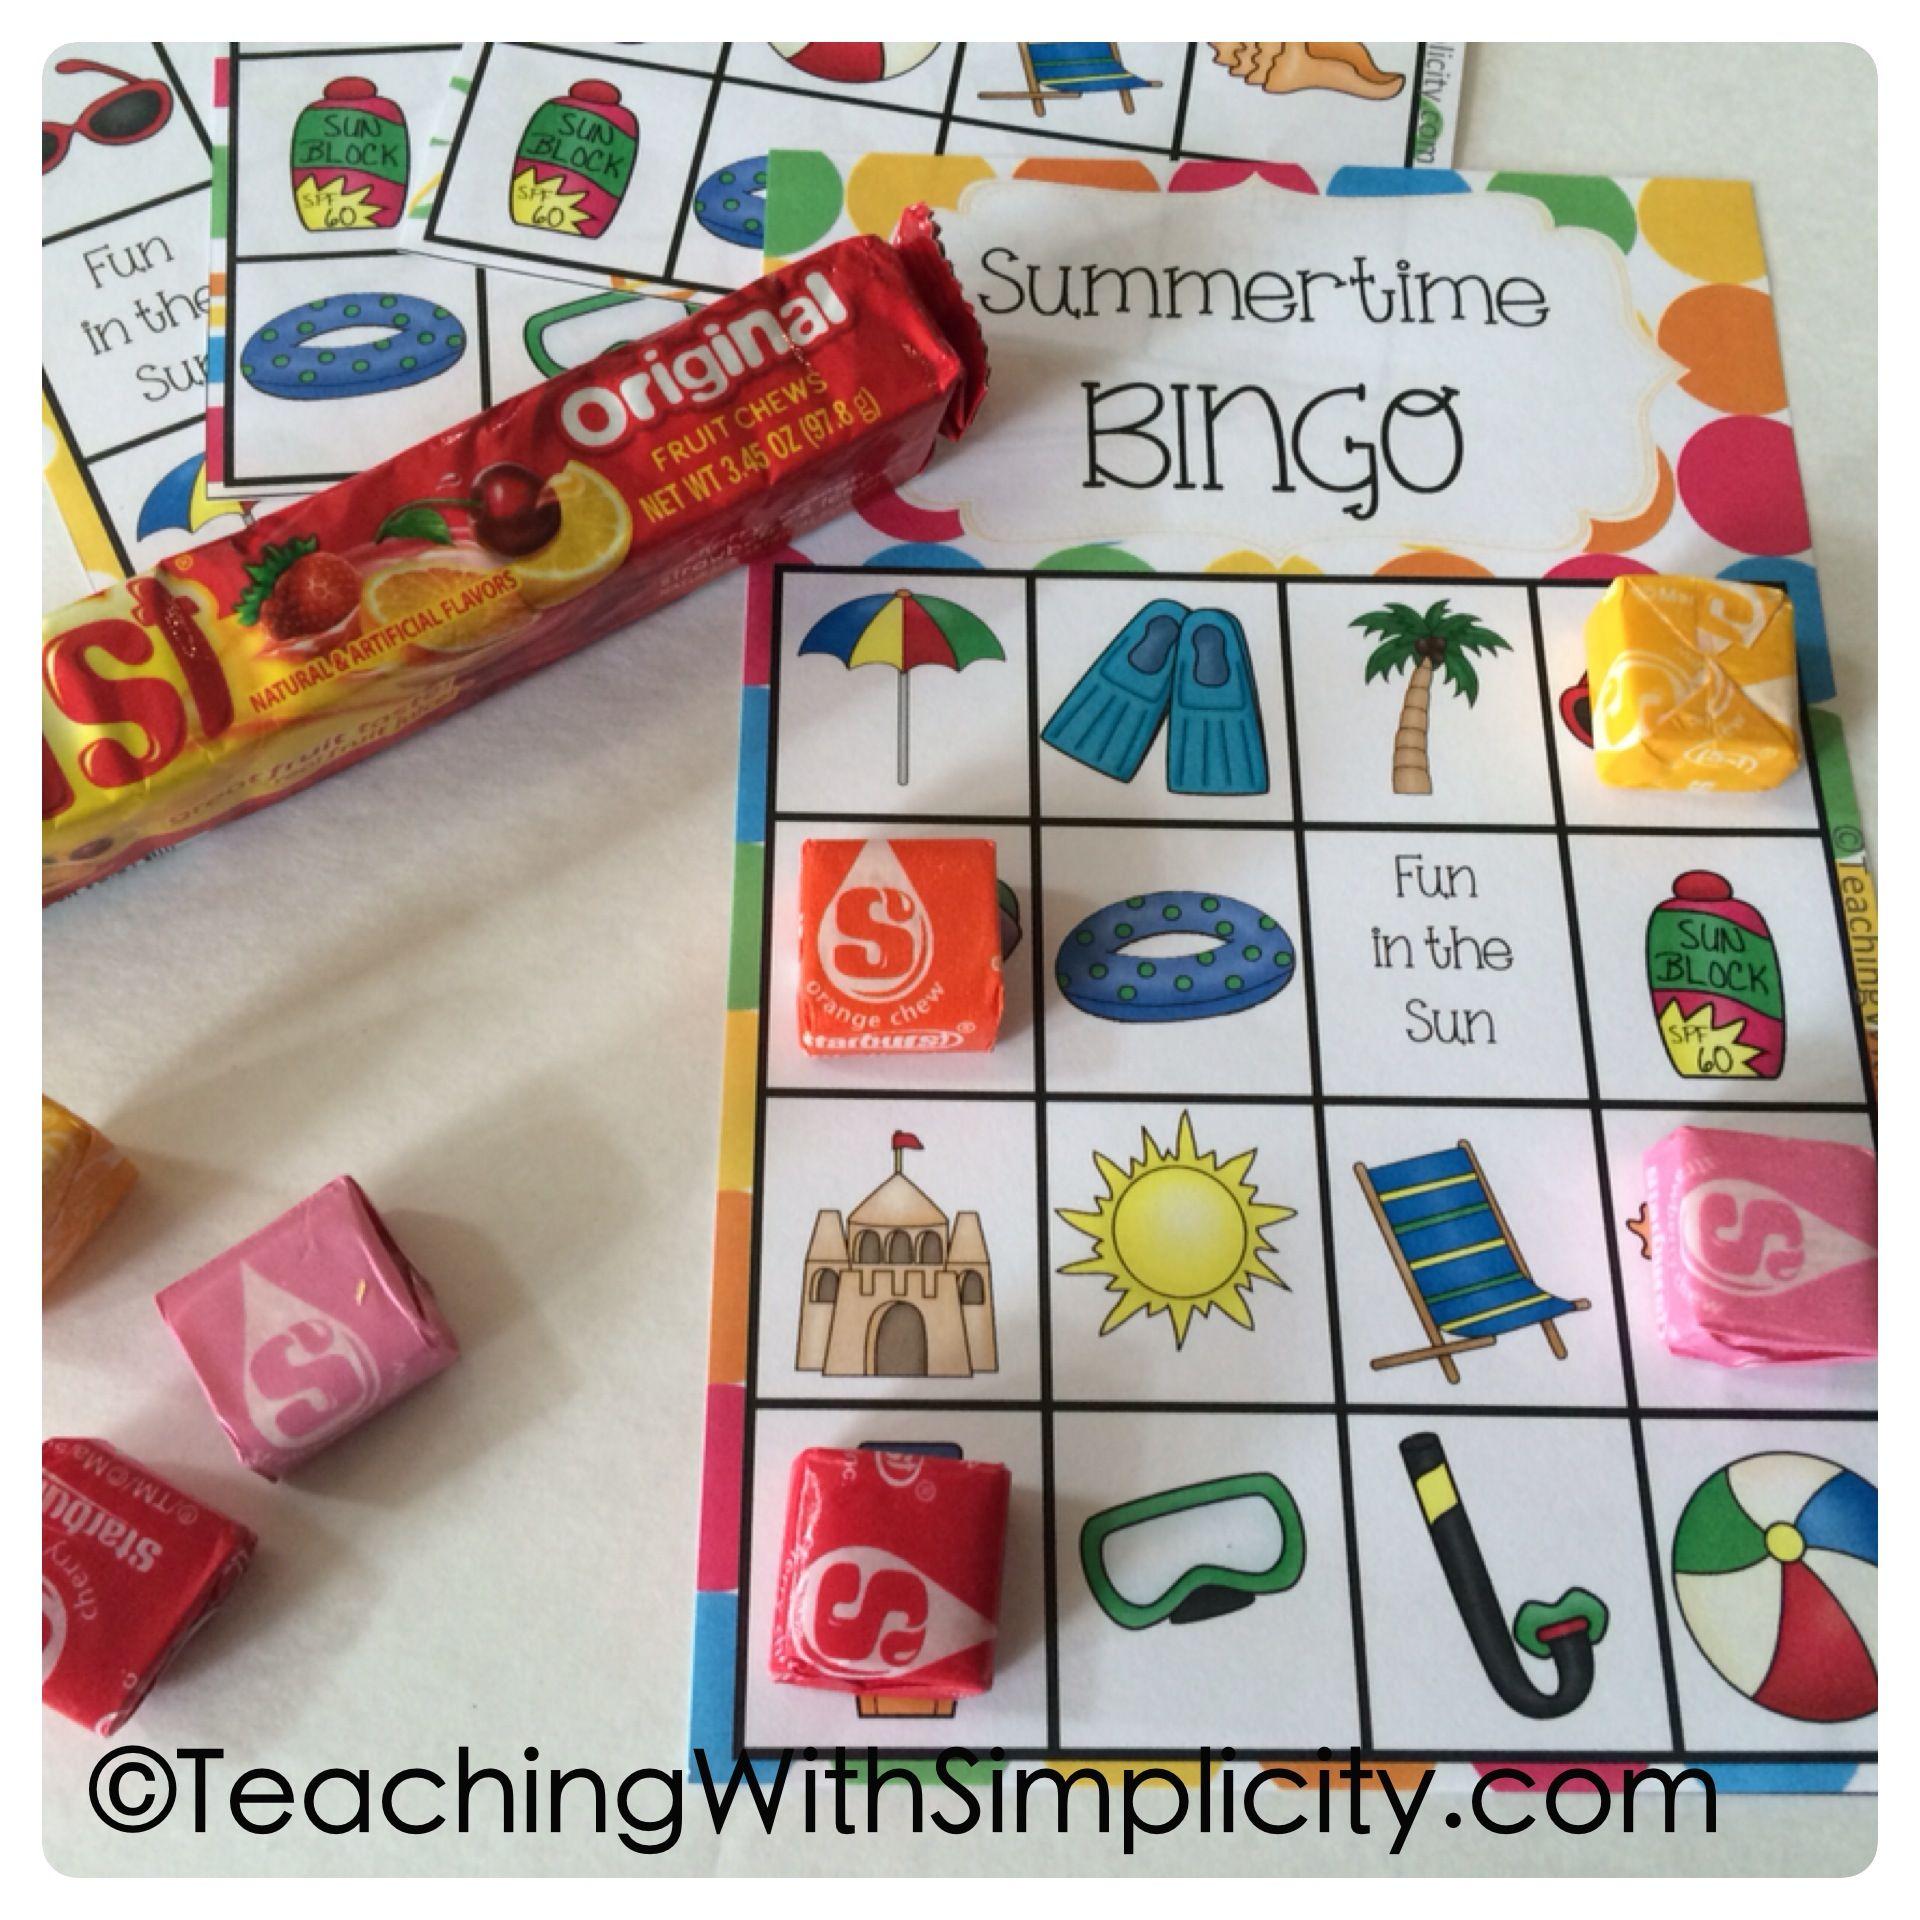 summertime bingo a fun free printable game it u0027s perfect for the